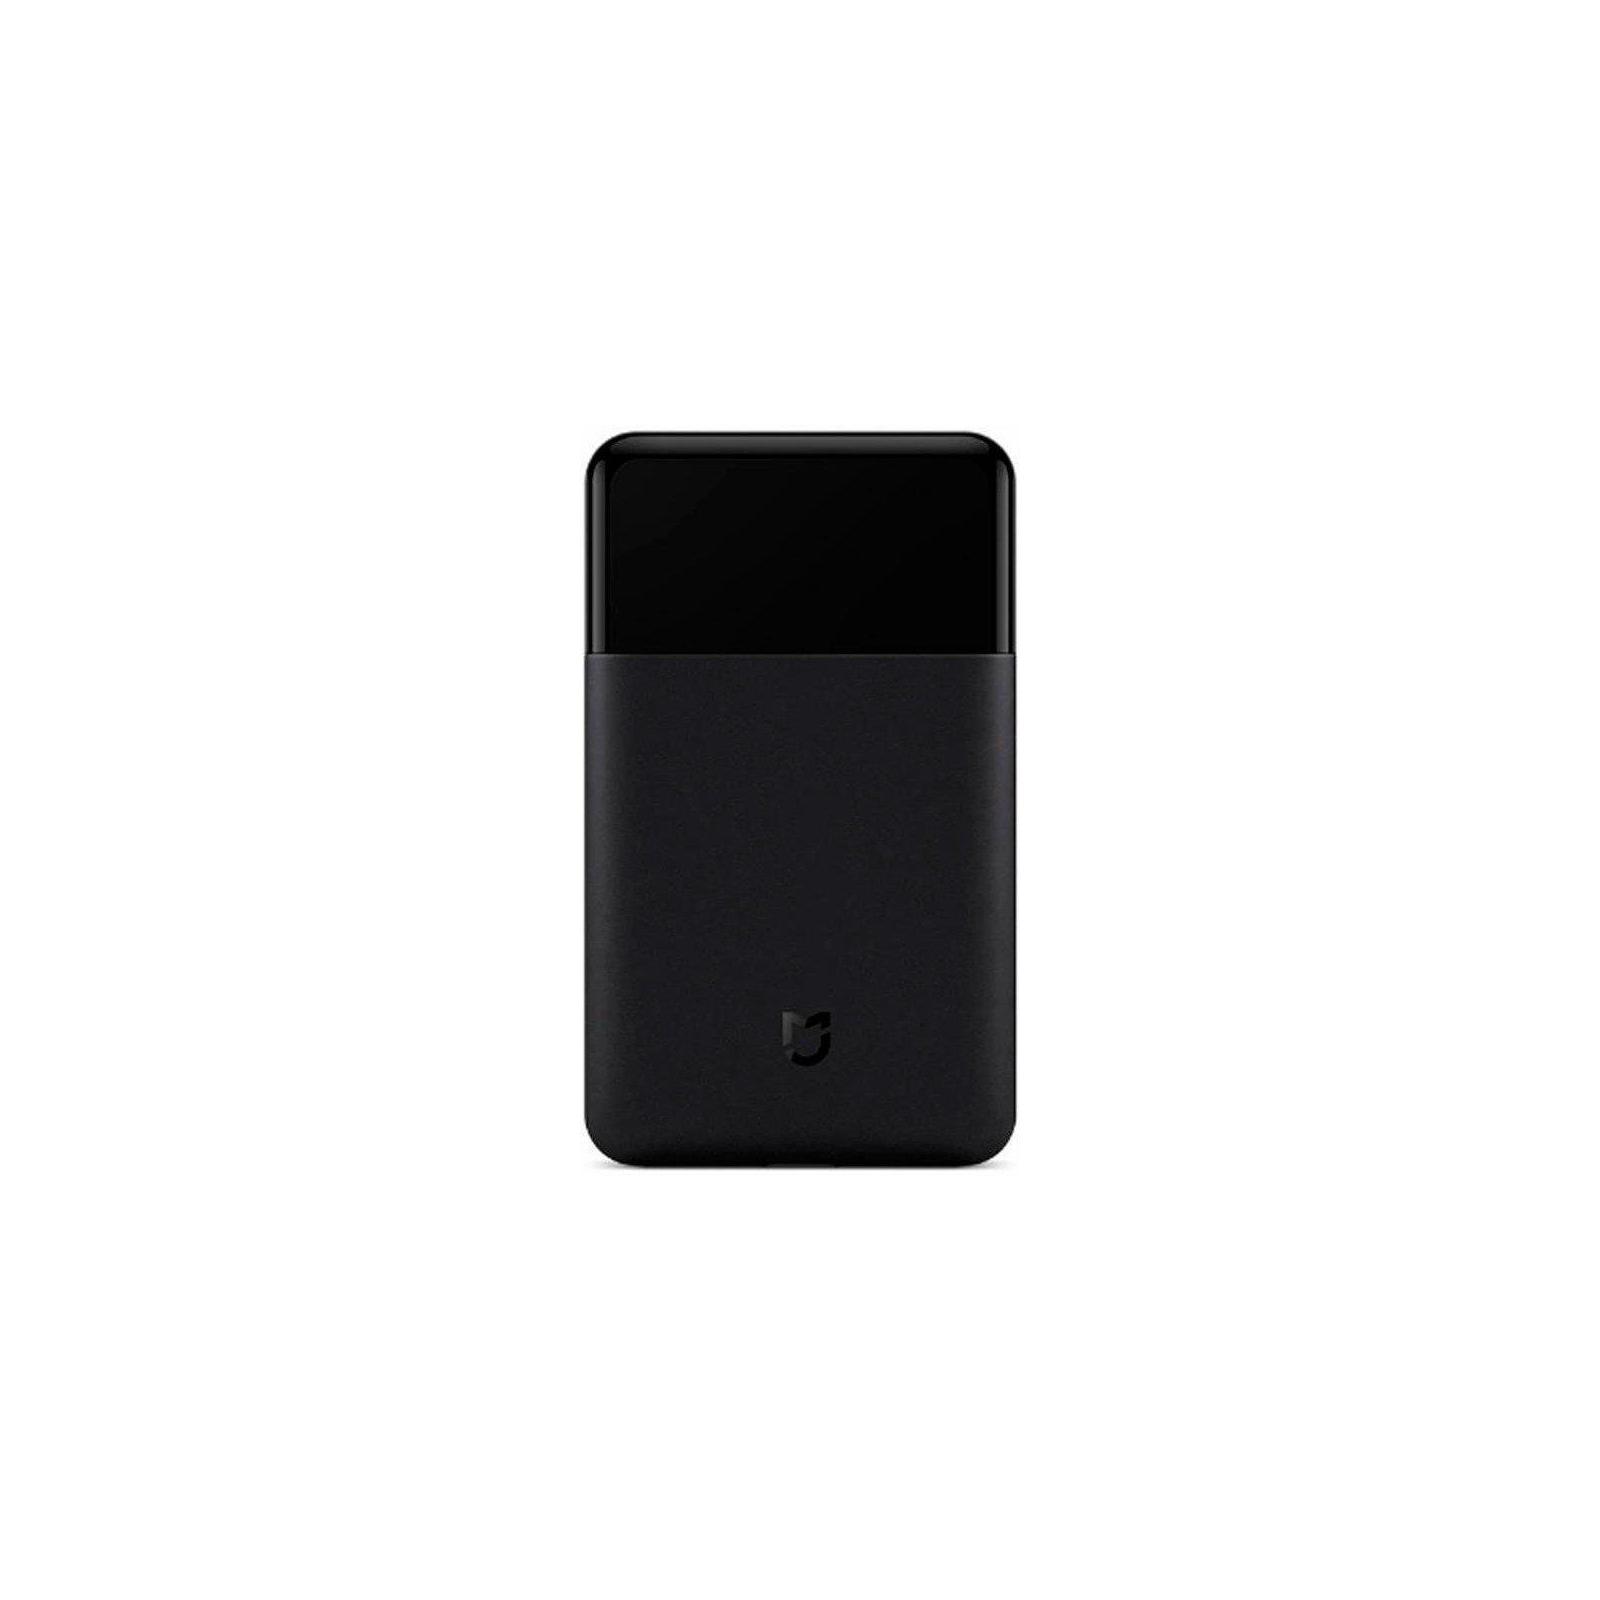 Электробритва Xiaomi MiJia Portable Electric Shaver Black изображение 2